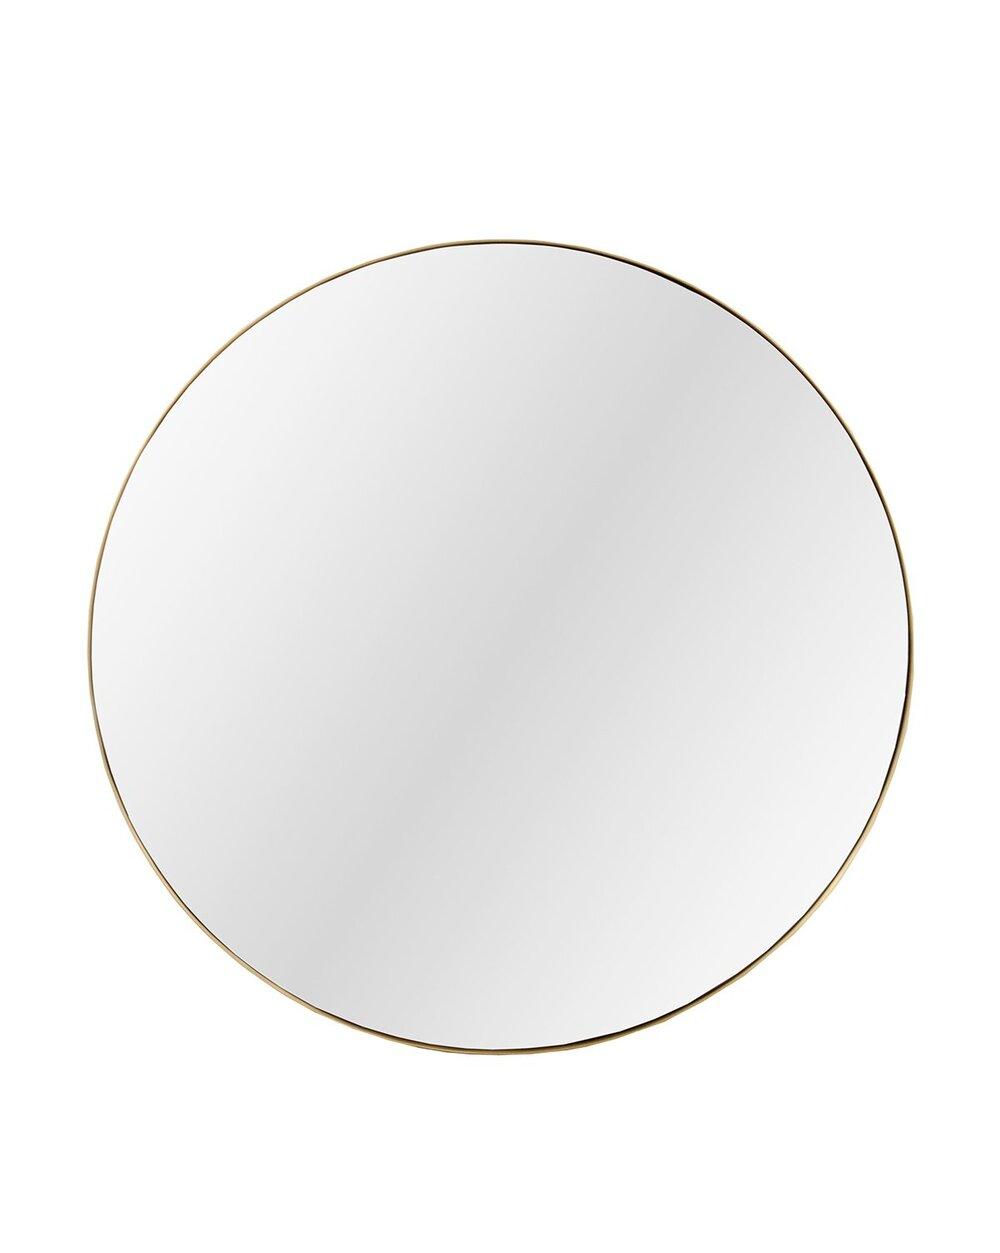 Jace_Inset_Mirror_-_Brass_circle_1.jpg